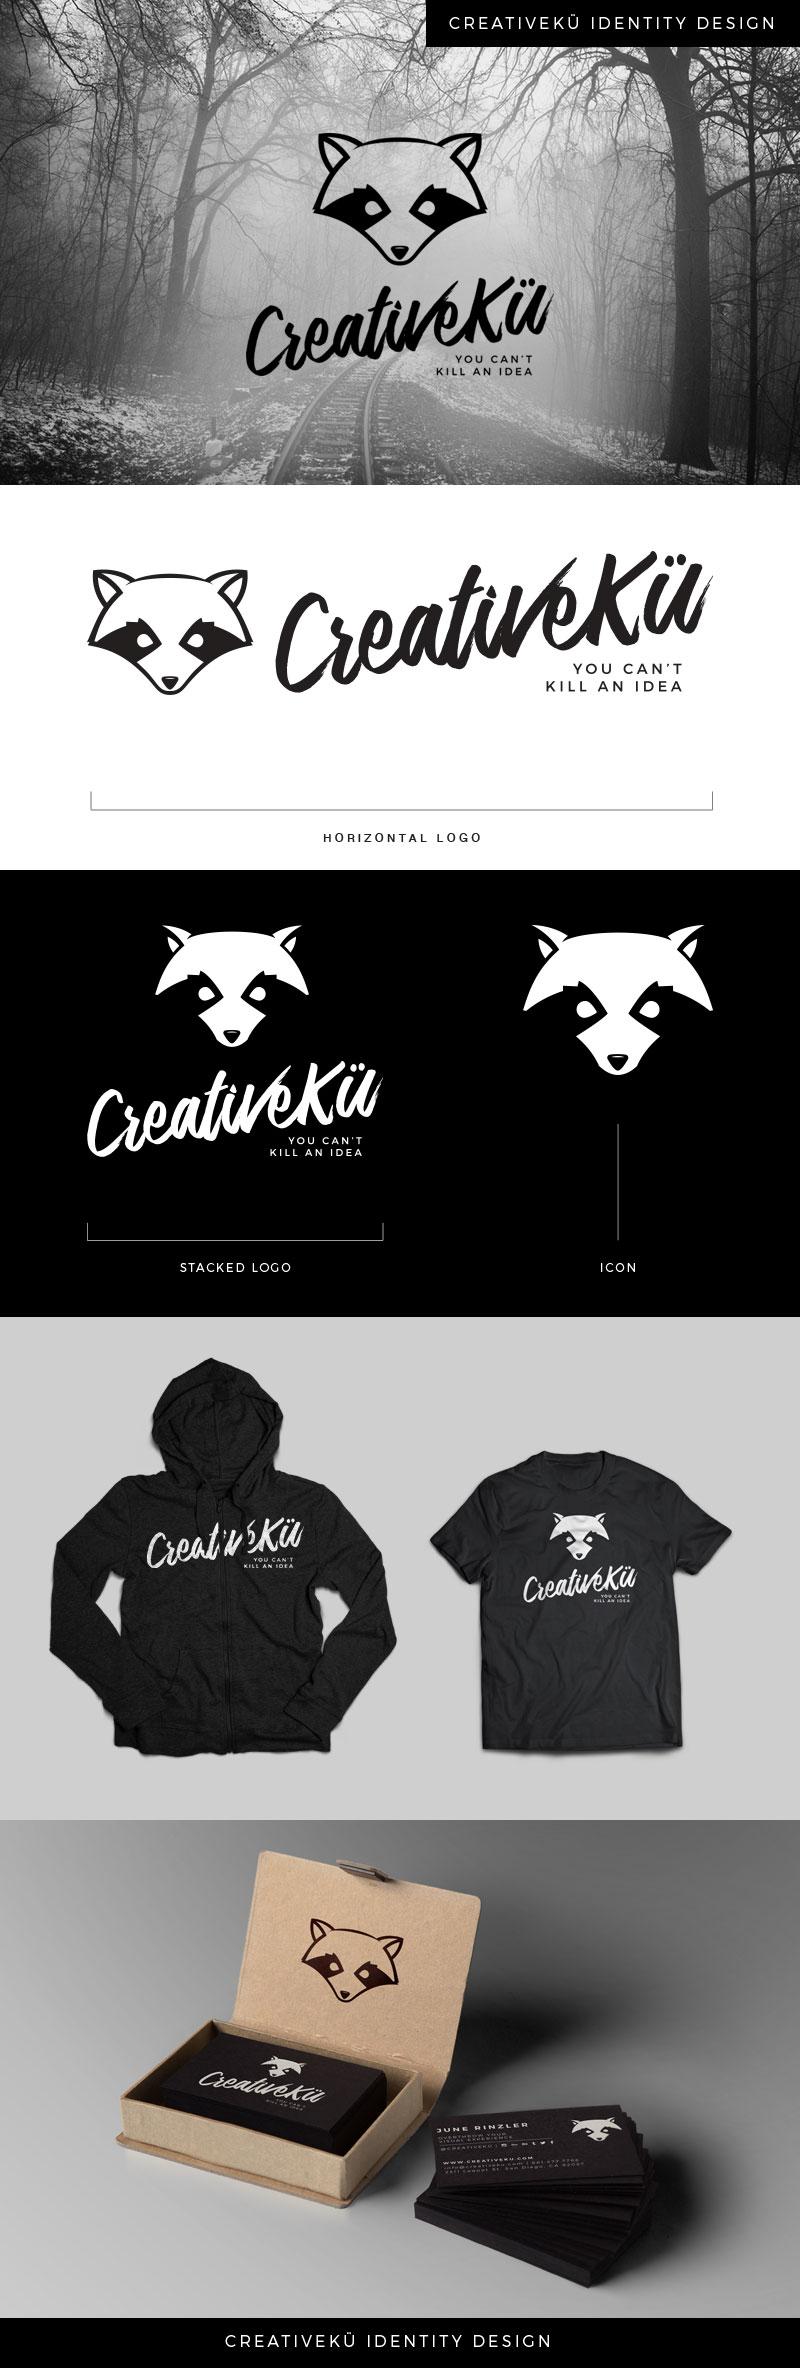 CreativeKu_Identity-Design.jpg